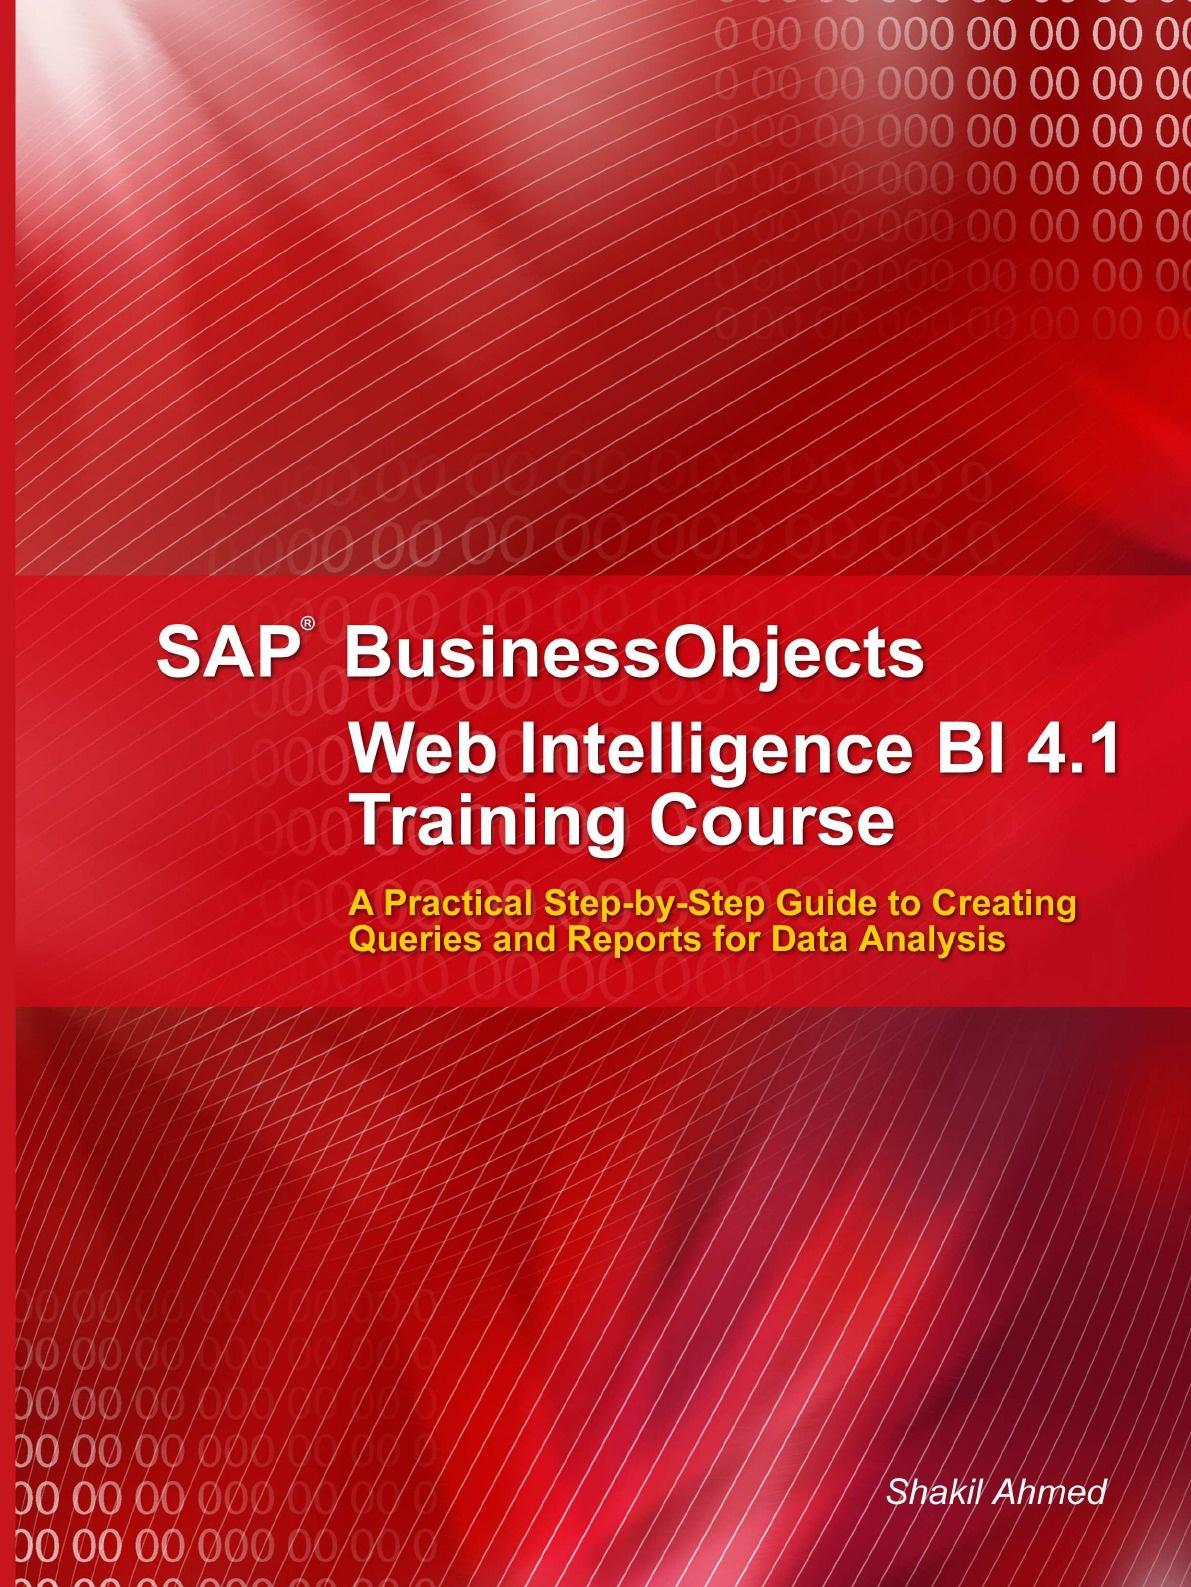 Shakil Ahmed SAP Businessobjects Web Intelligence 4.1 Training Course francesco trucchia francesco fullone ez publish 4 enterprise web sites step by step